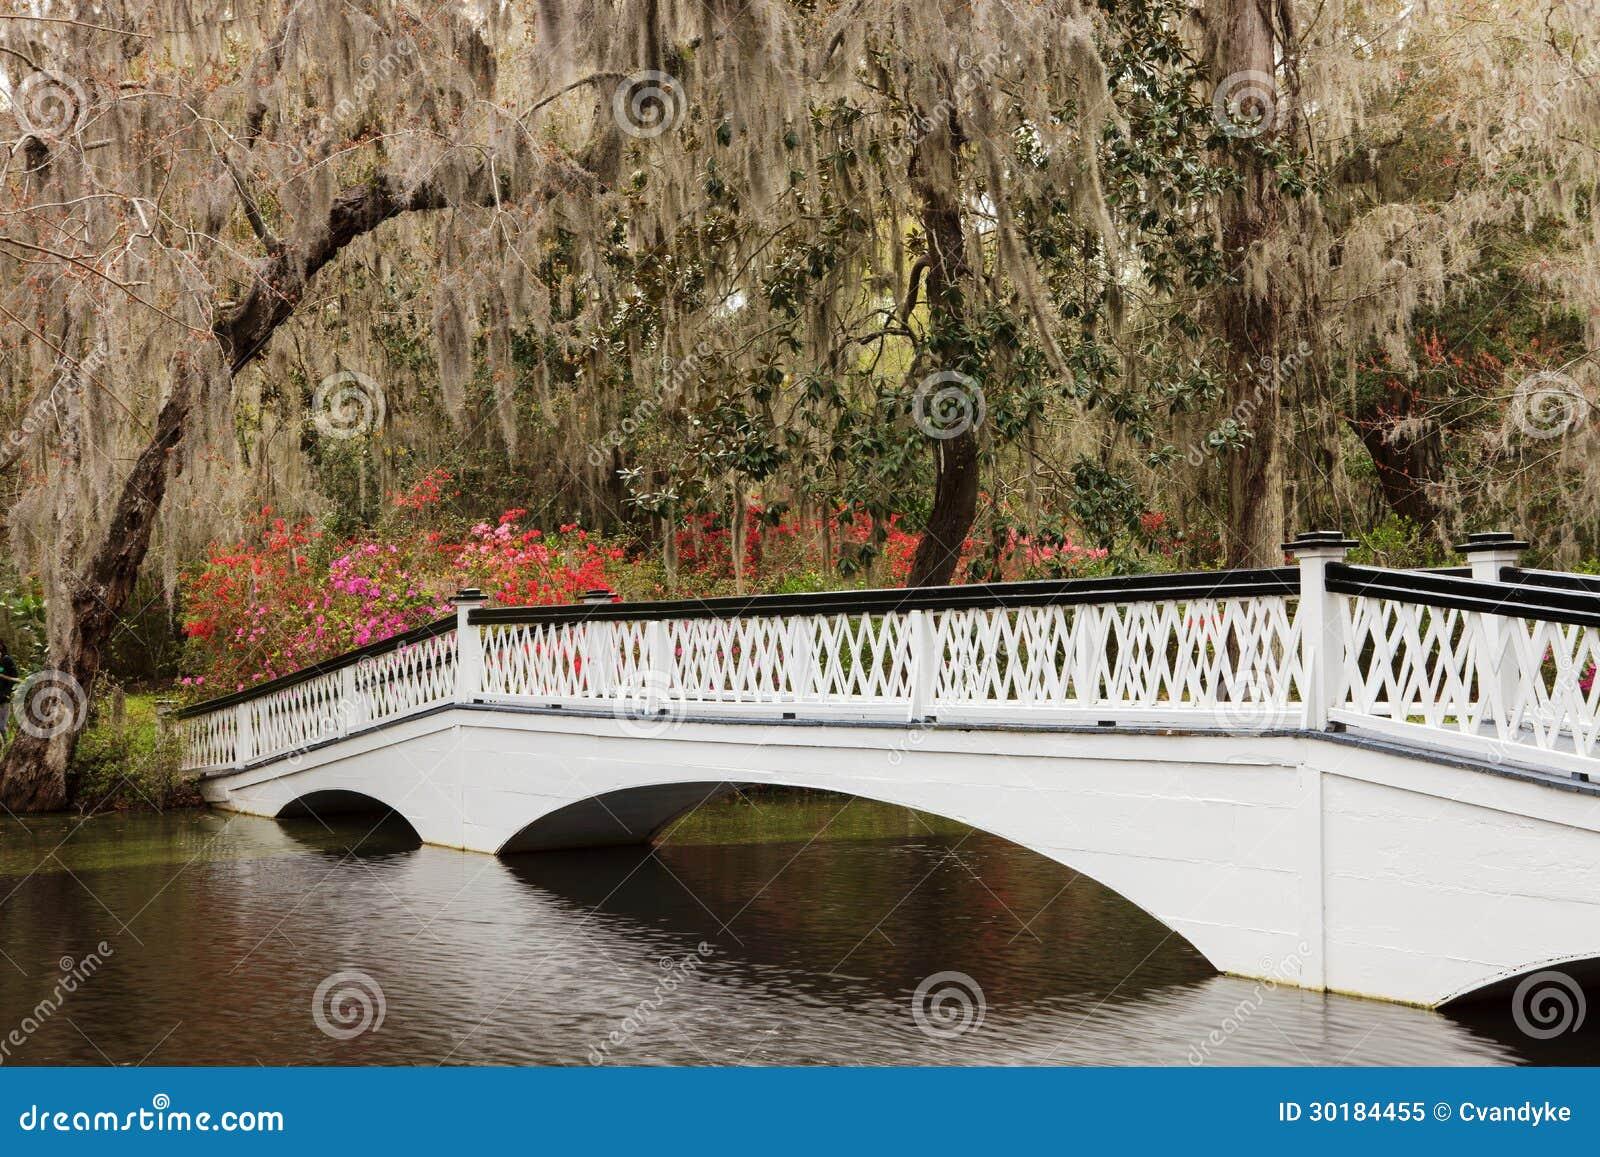 Ornamental White Bridge Magnolia Plantation SC Stock Image - Image ...